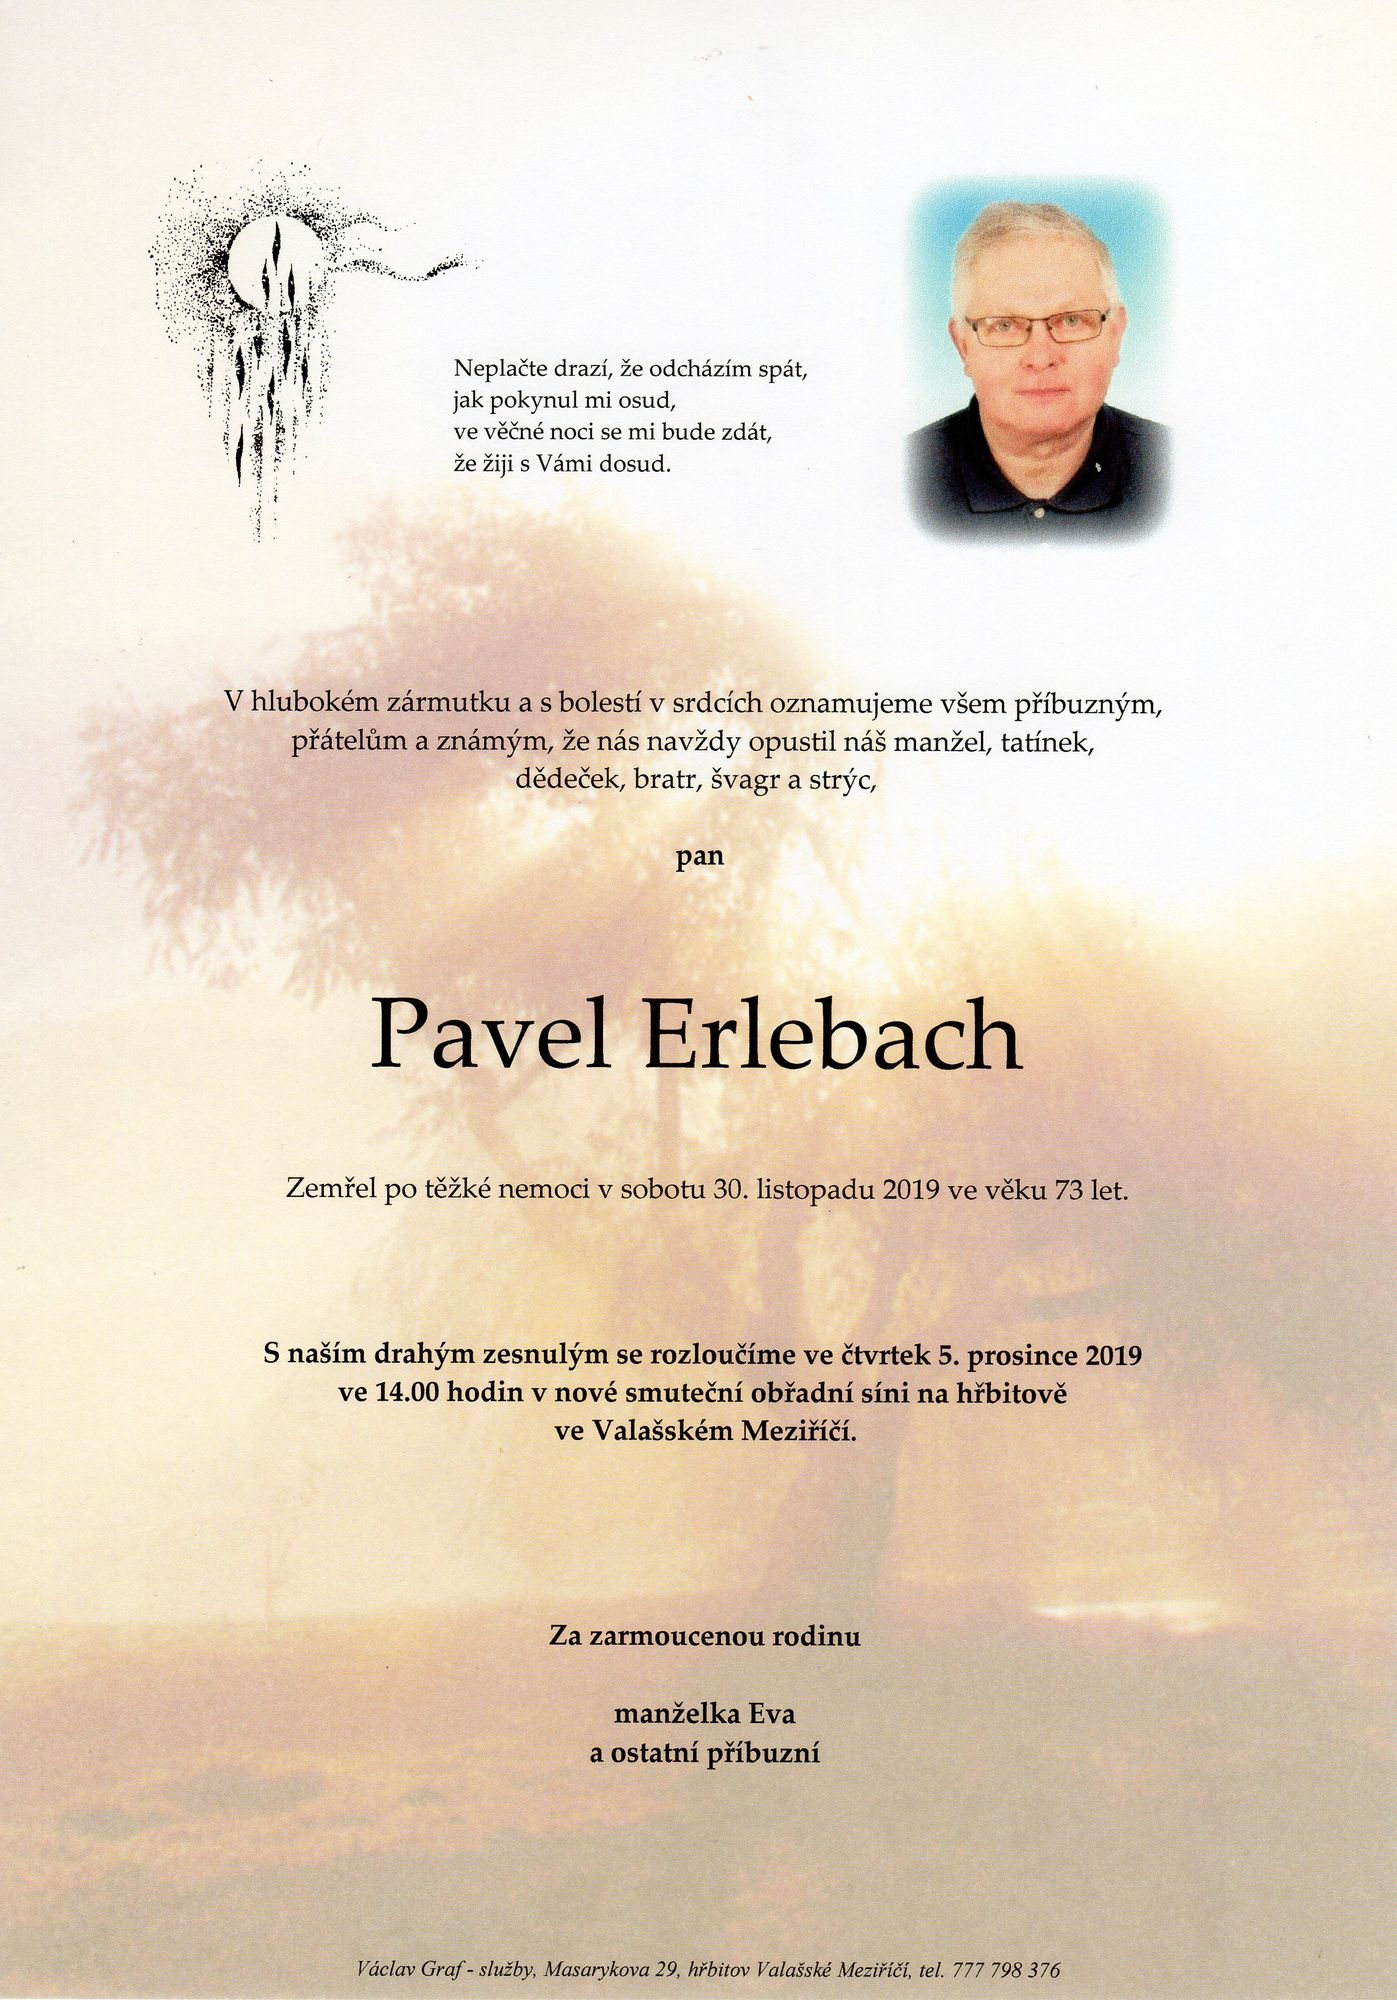 Pavel Erlebach